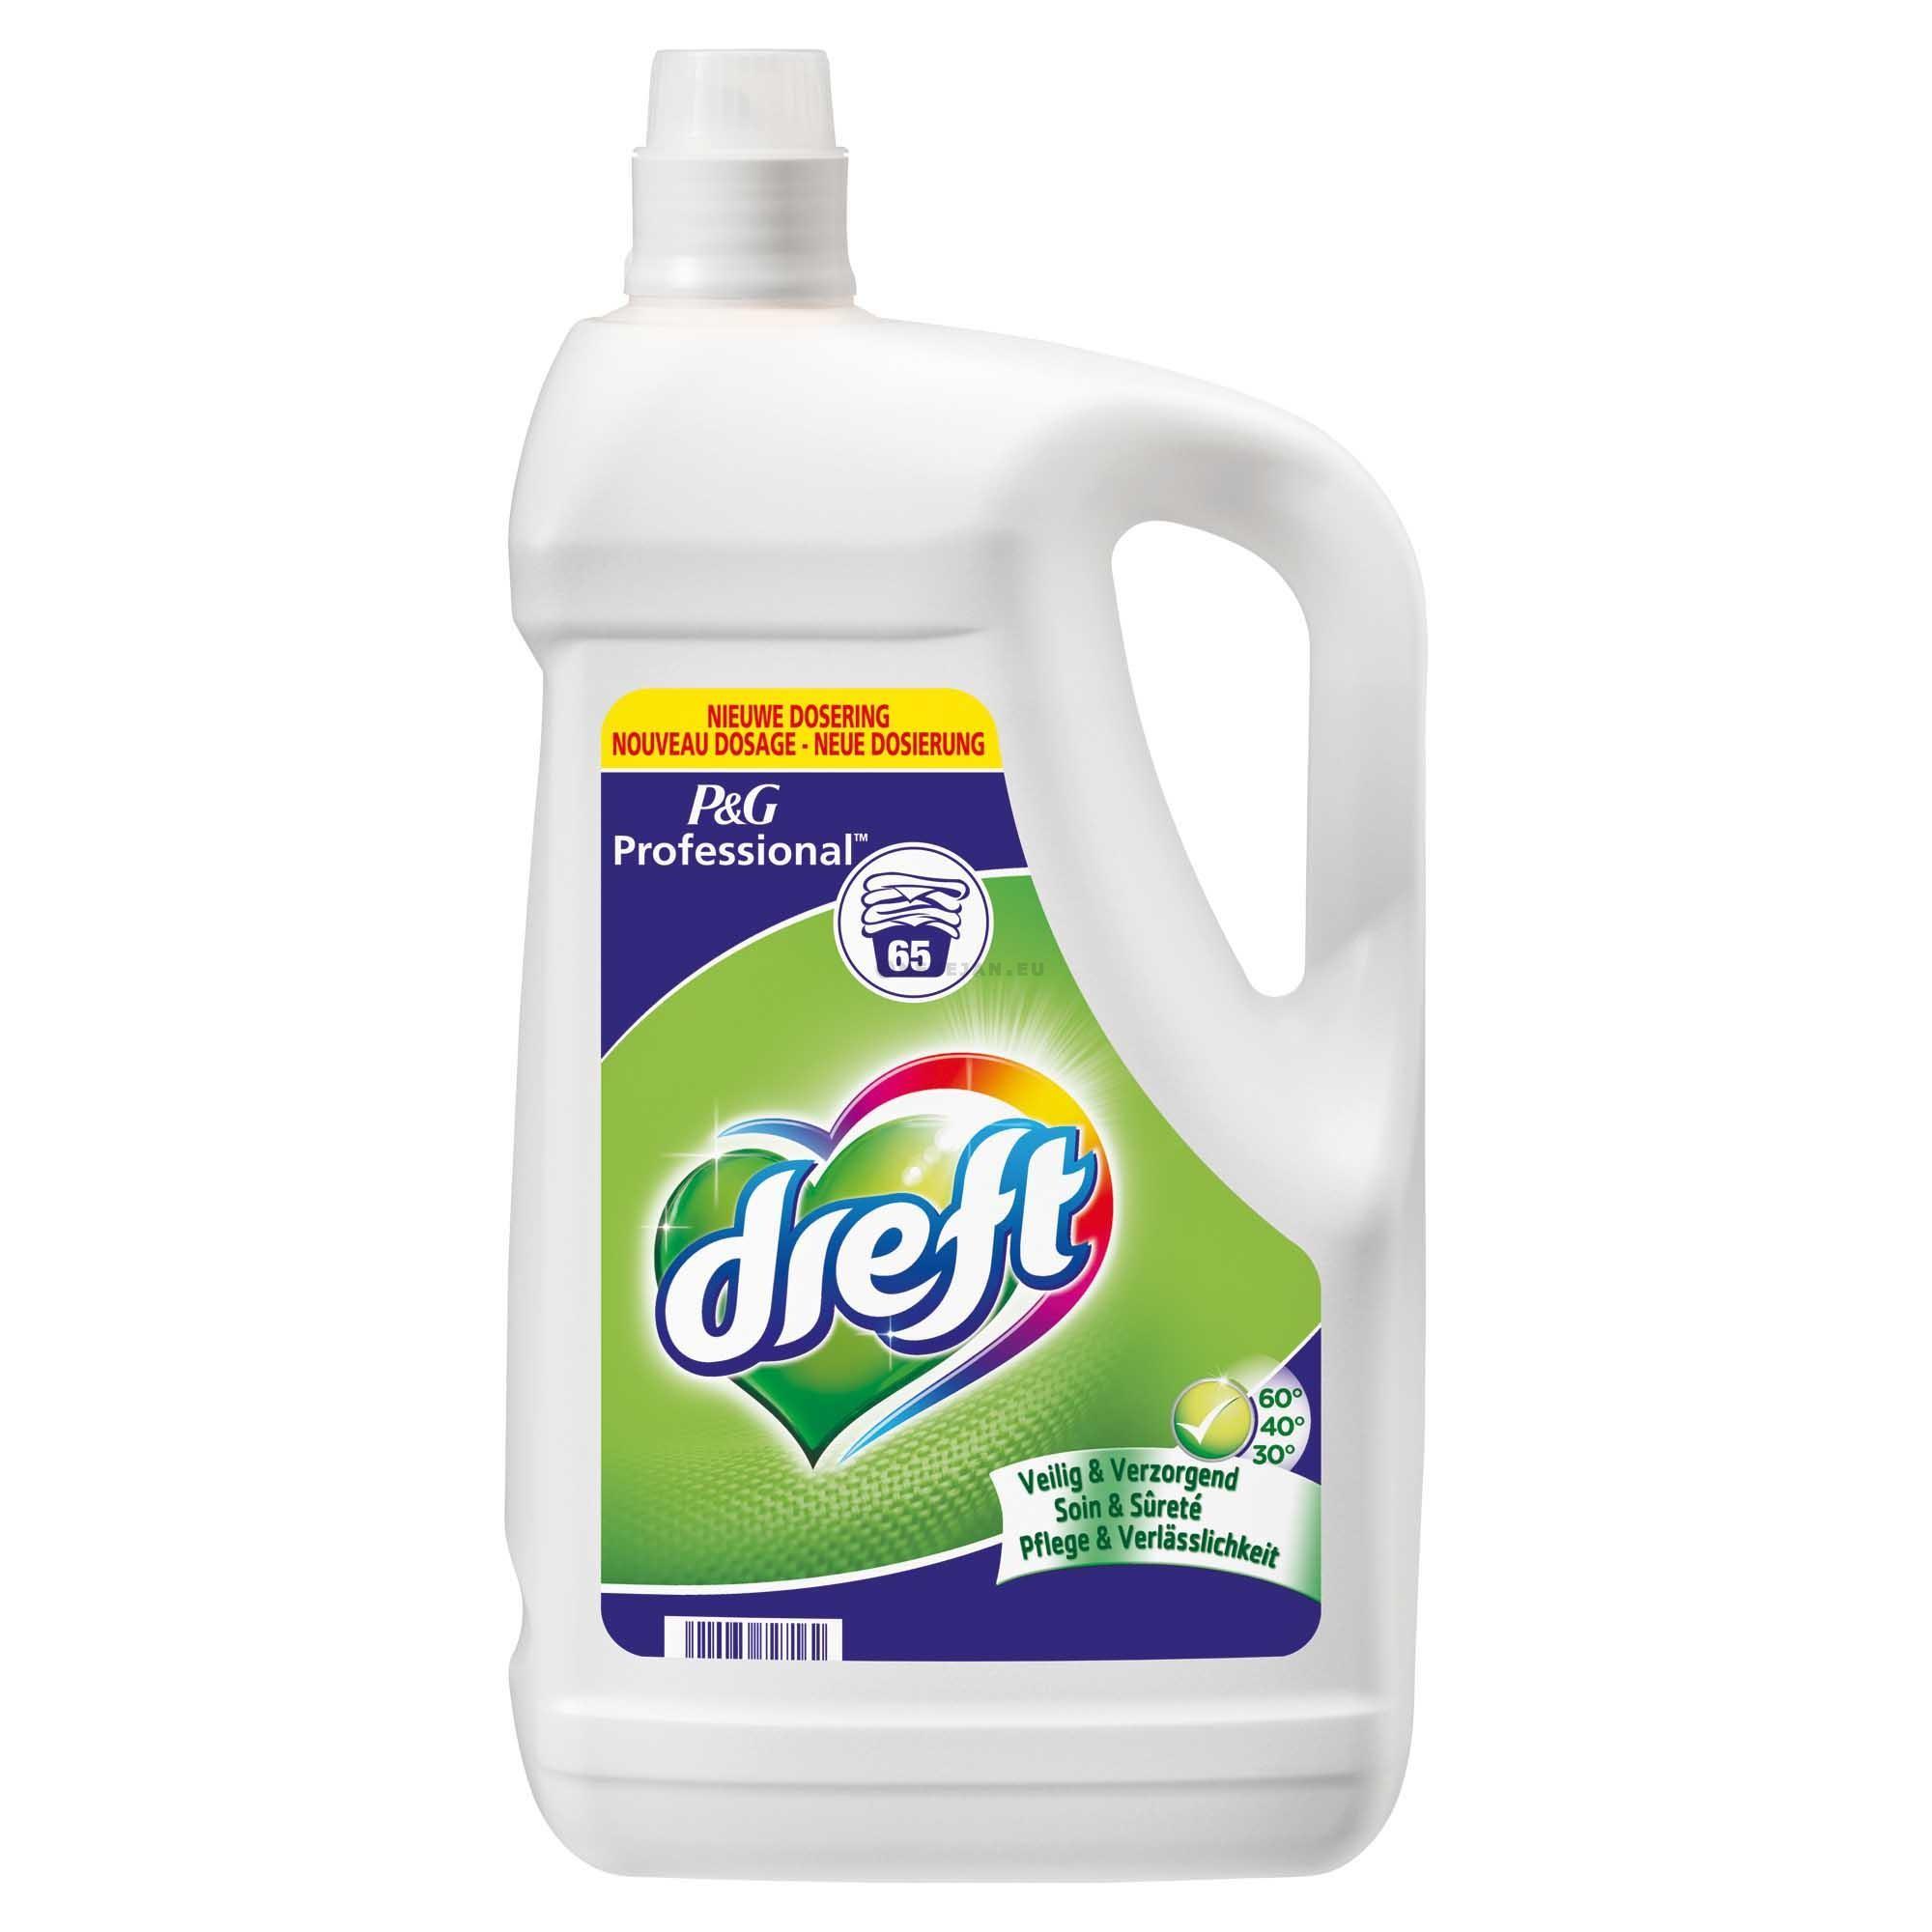 Dreft lessive delicat liquide 5L Professionel